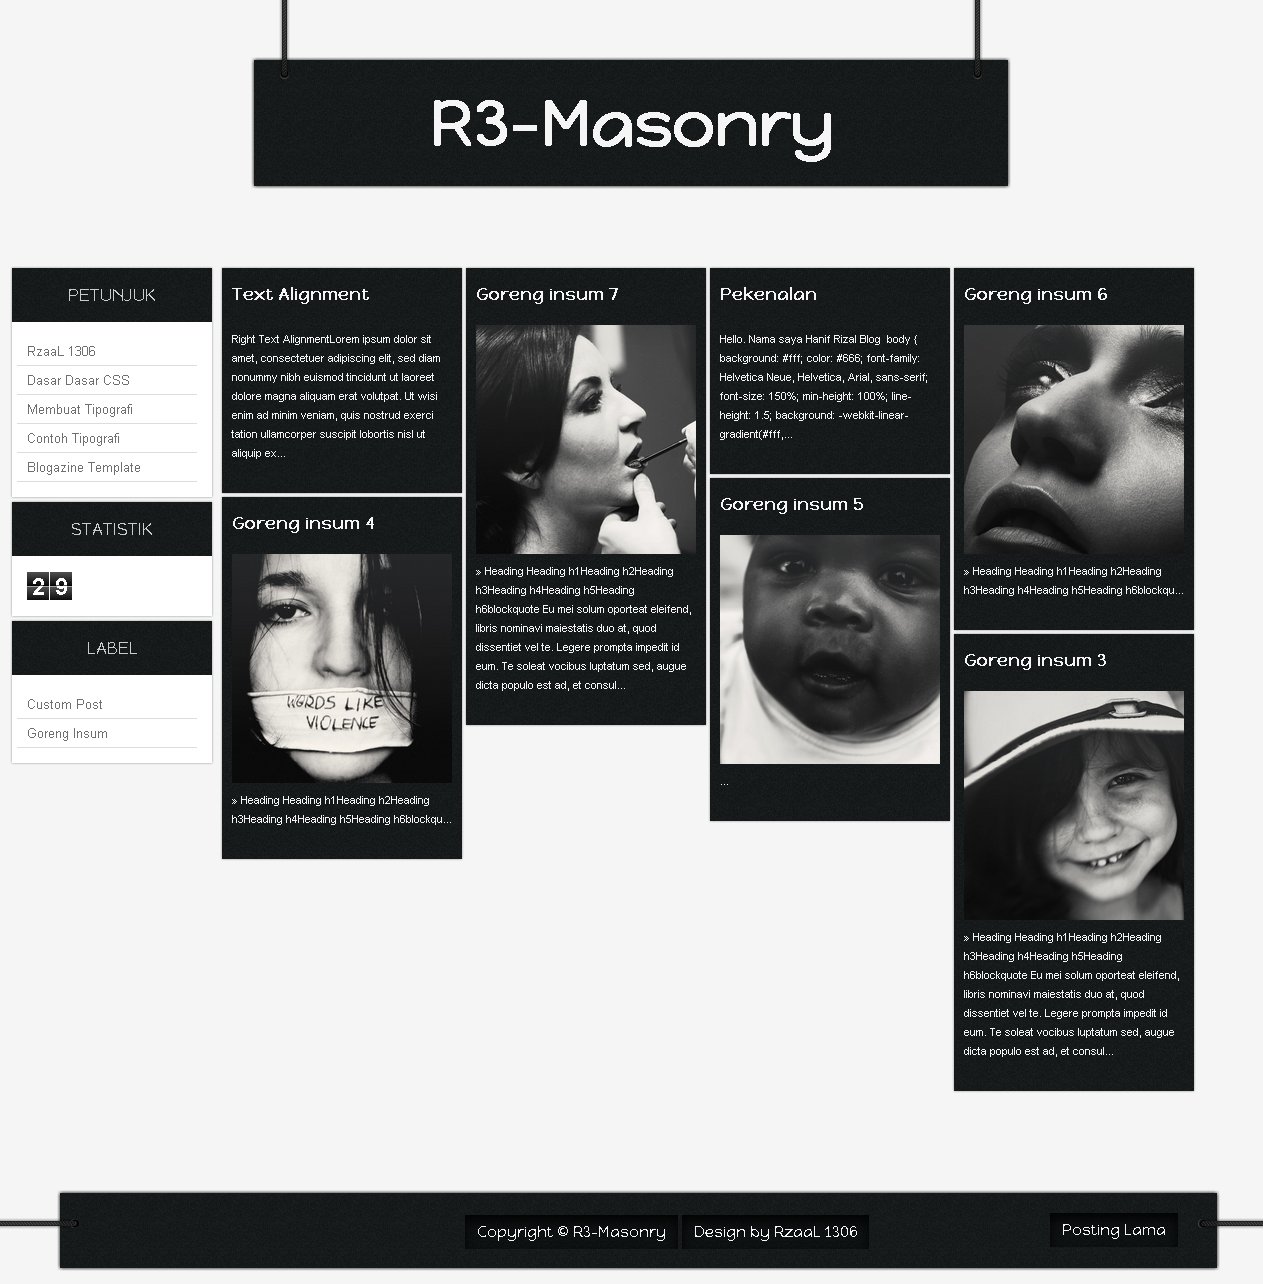 R3-Masonry Blogazine Template